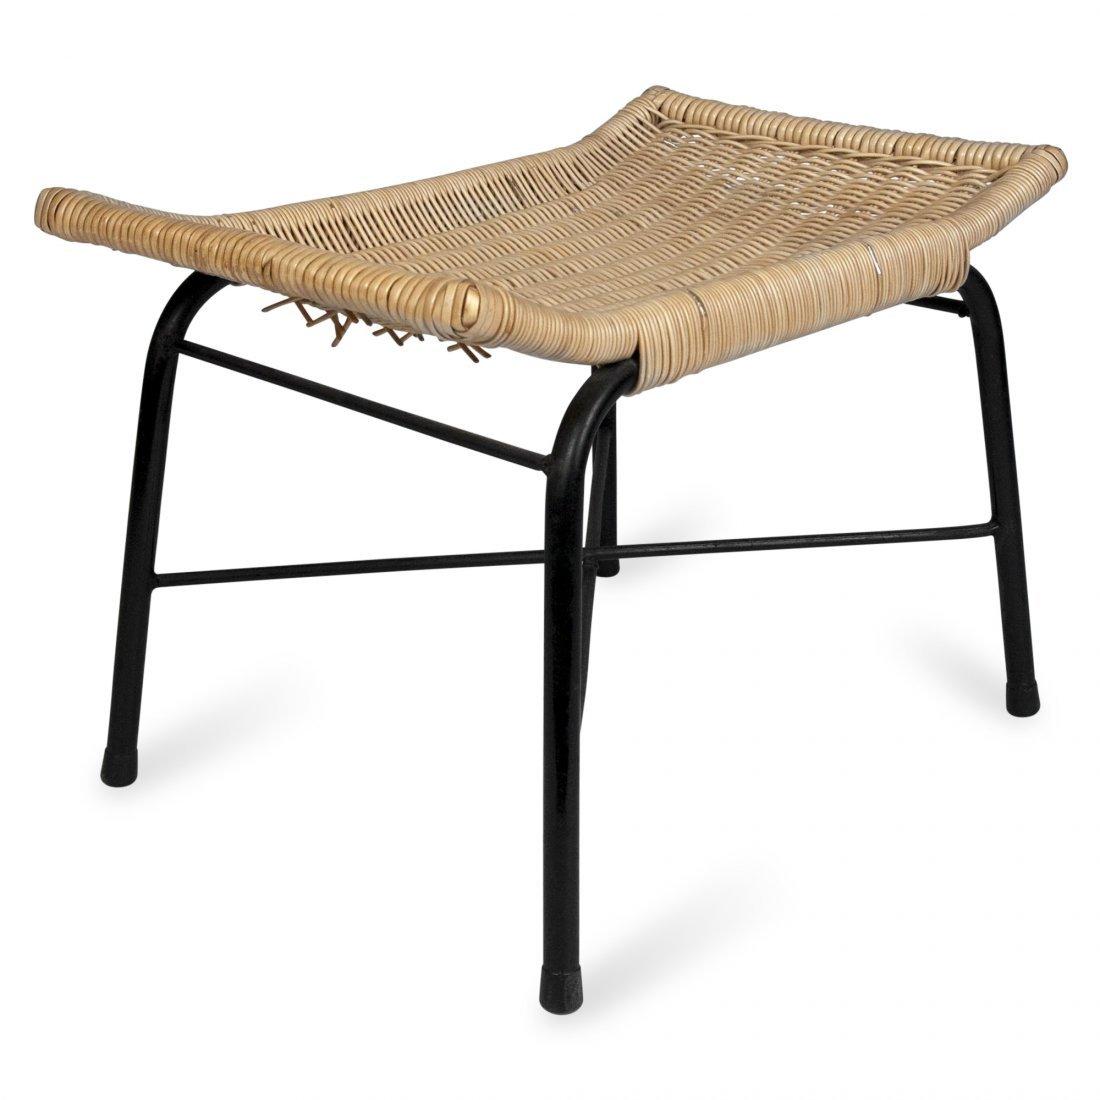 Arthur Umanoff Woven Seat Bench